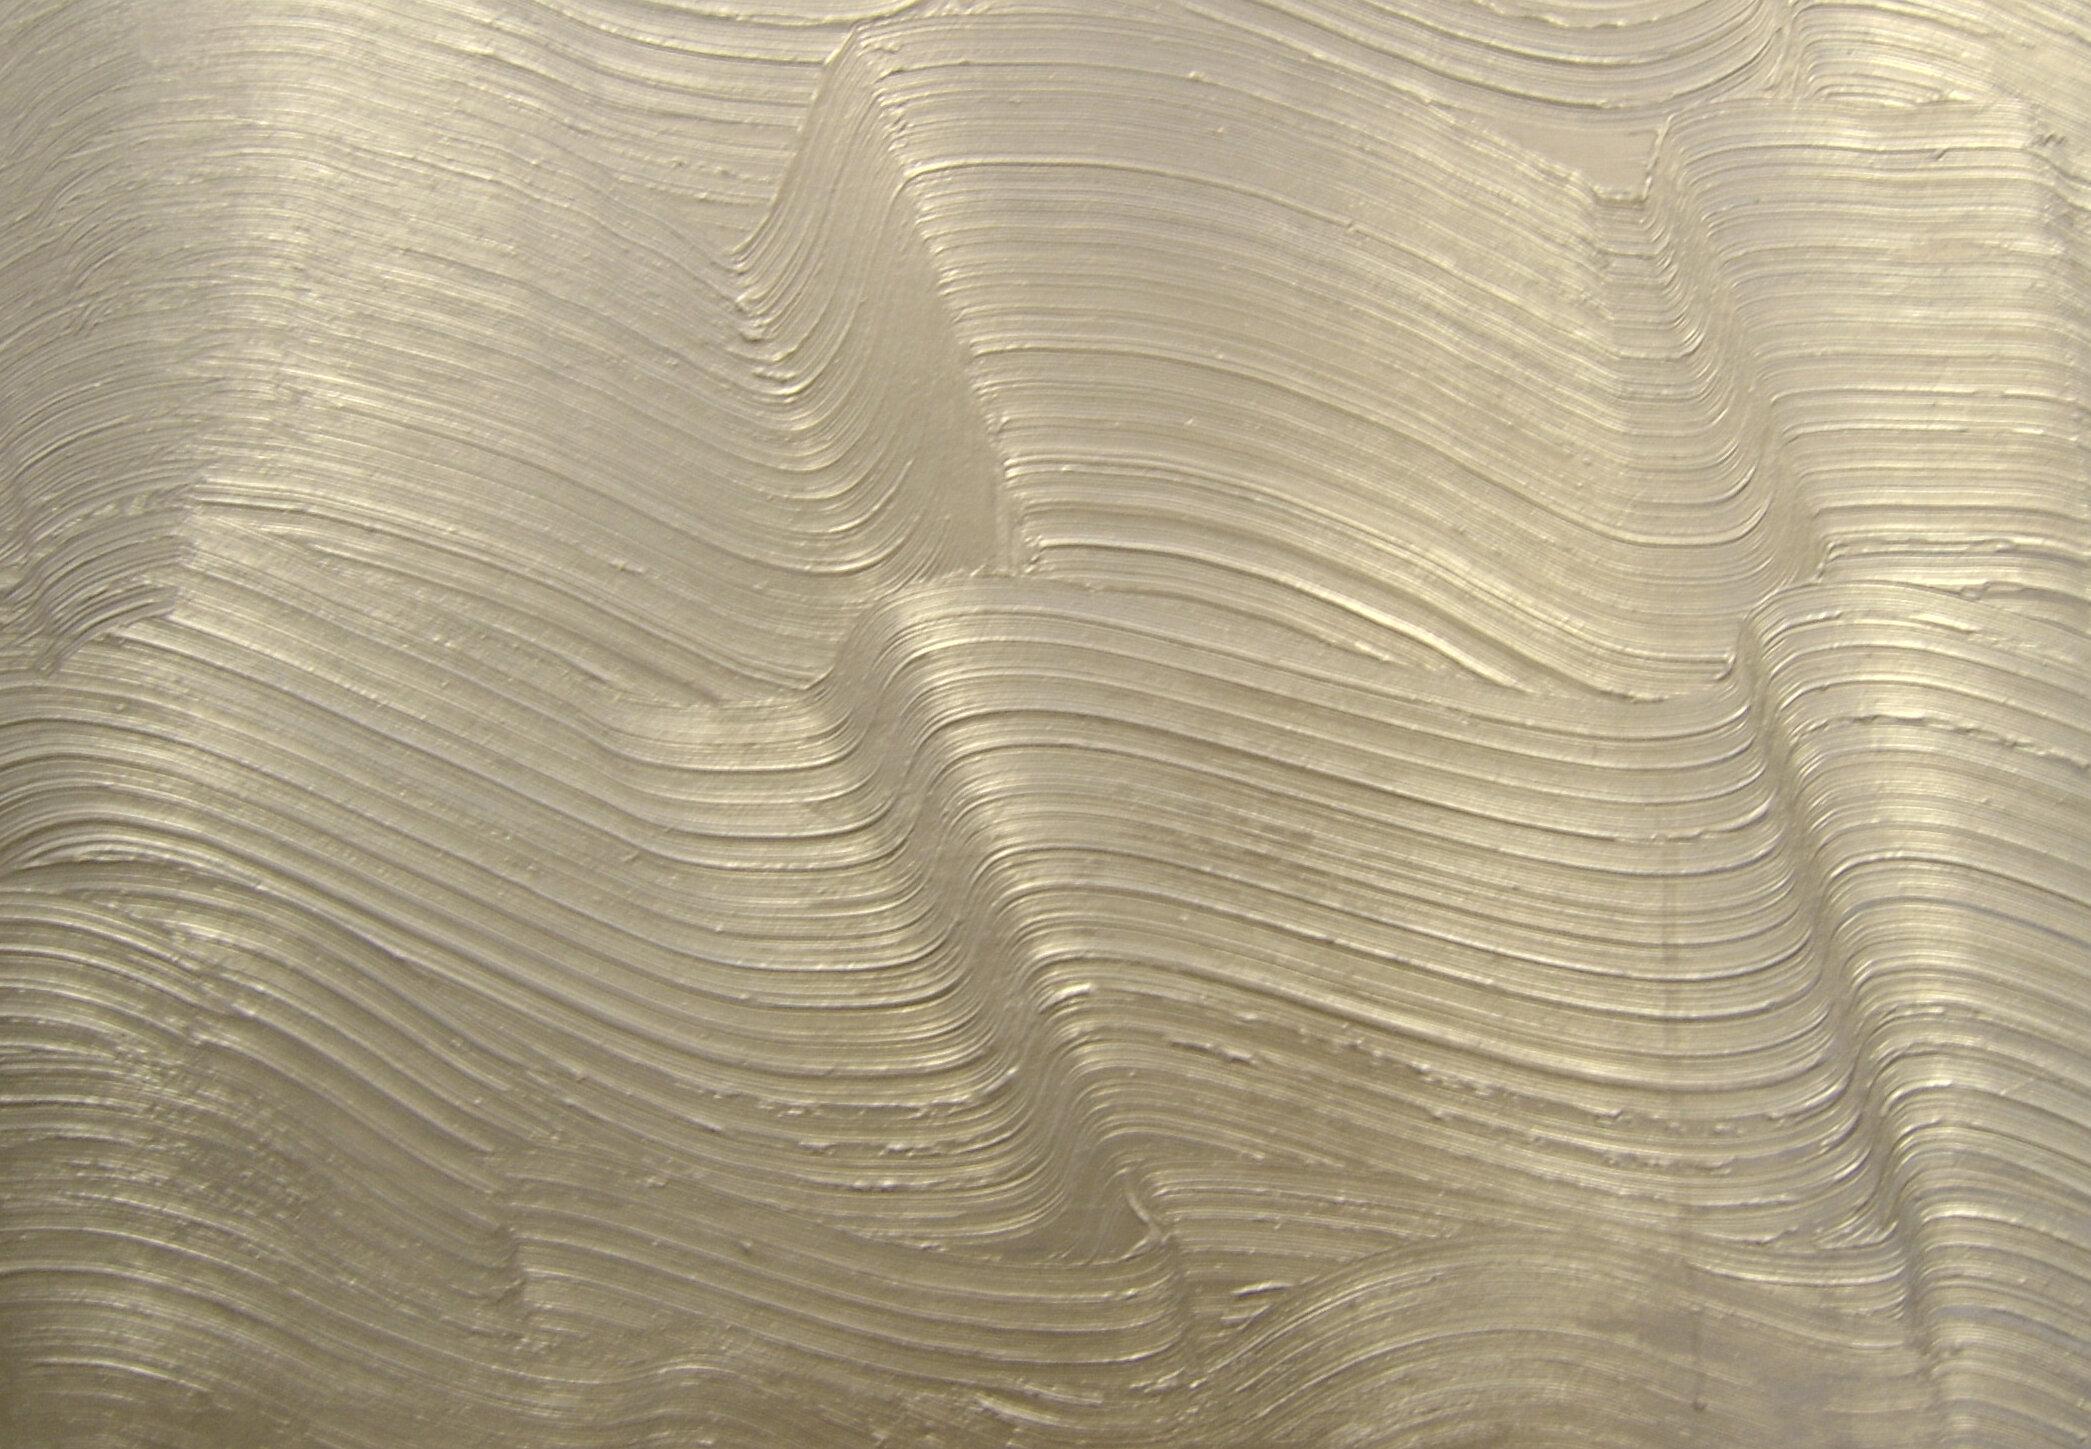 Evewear plaster copy.jpg